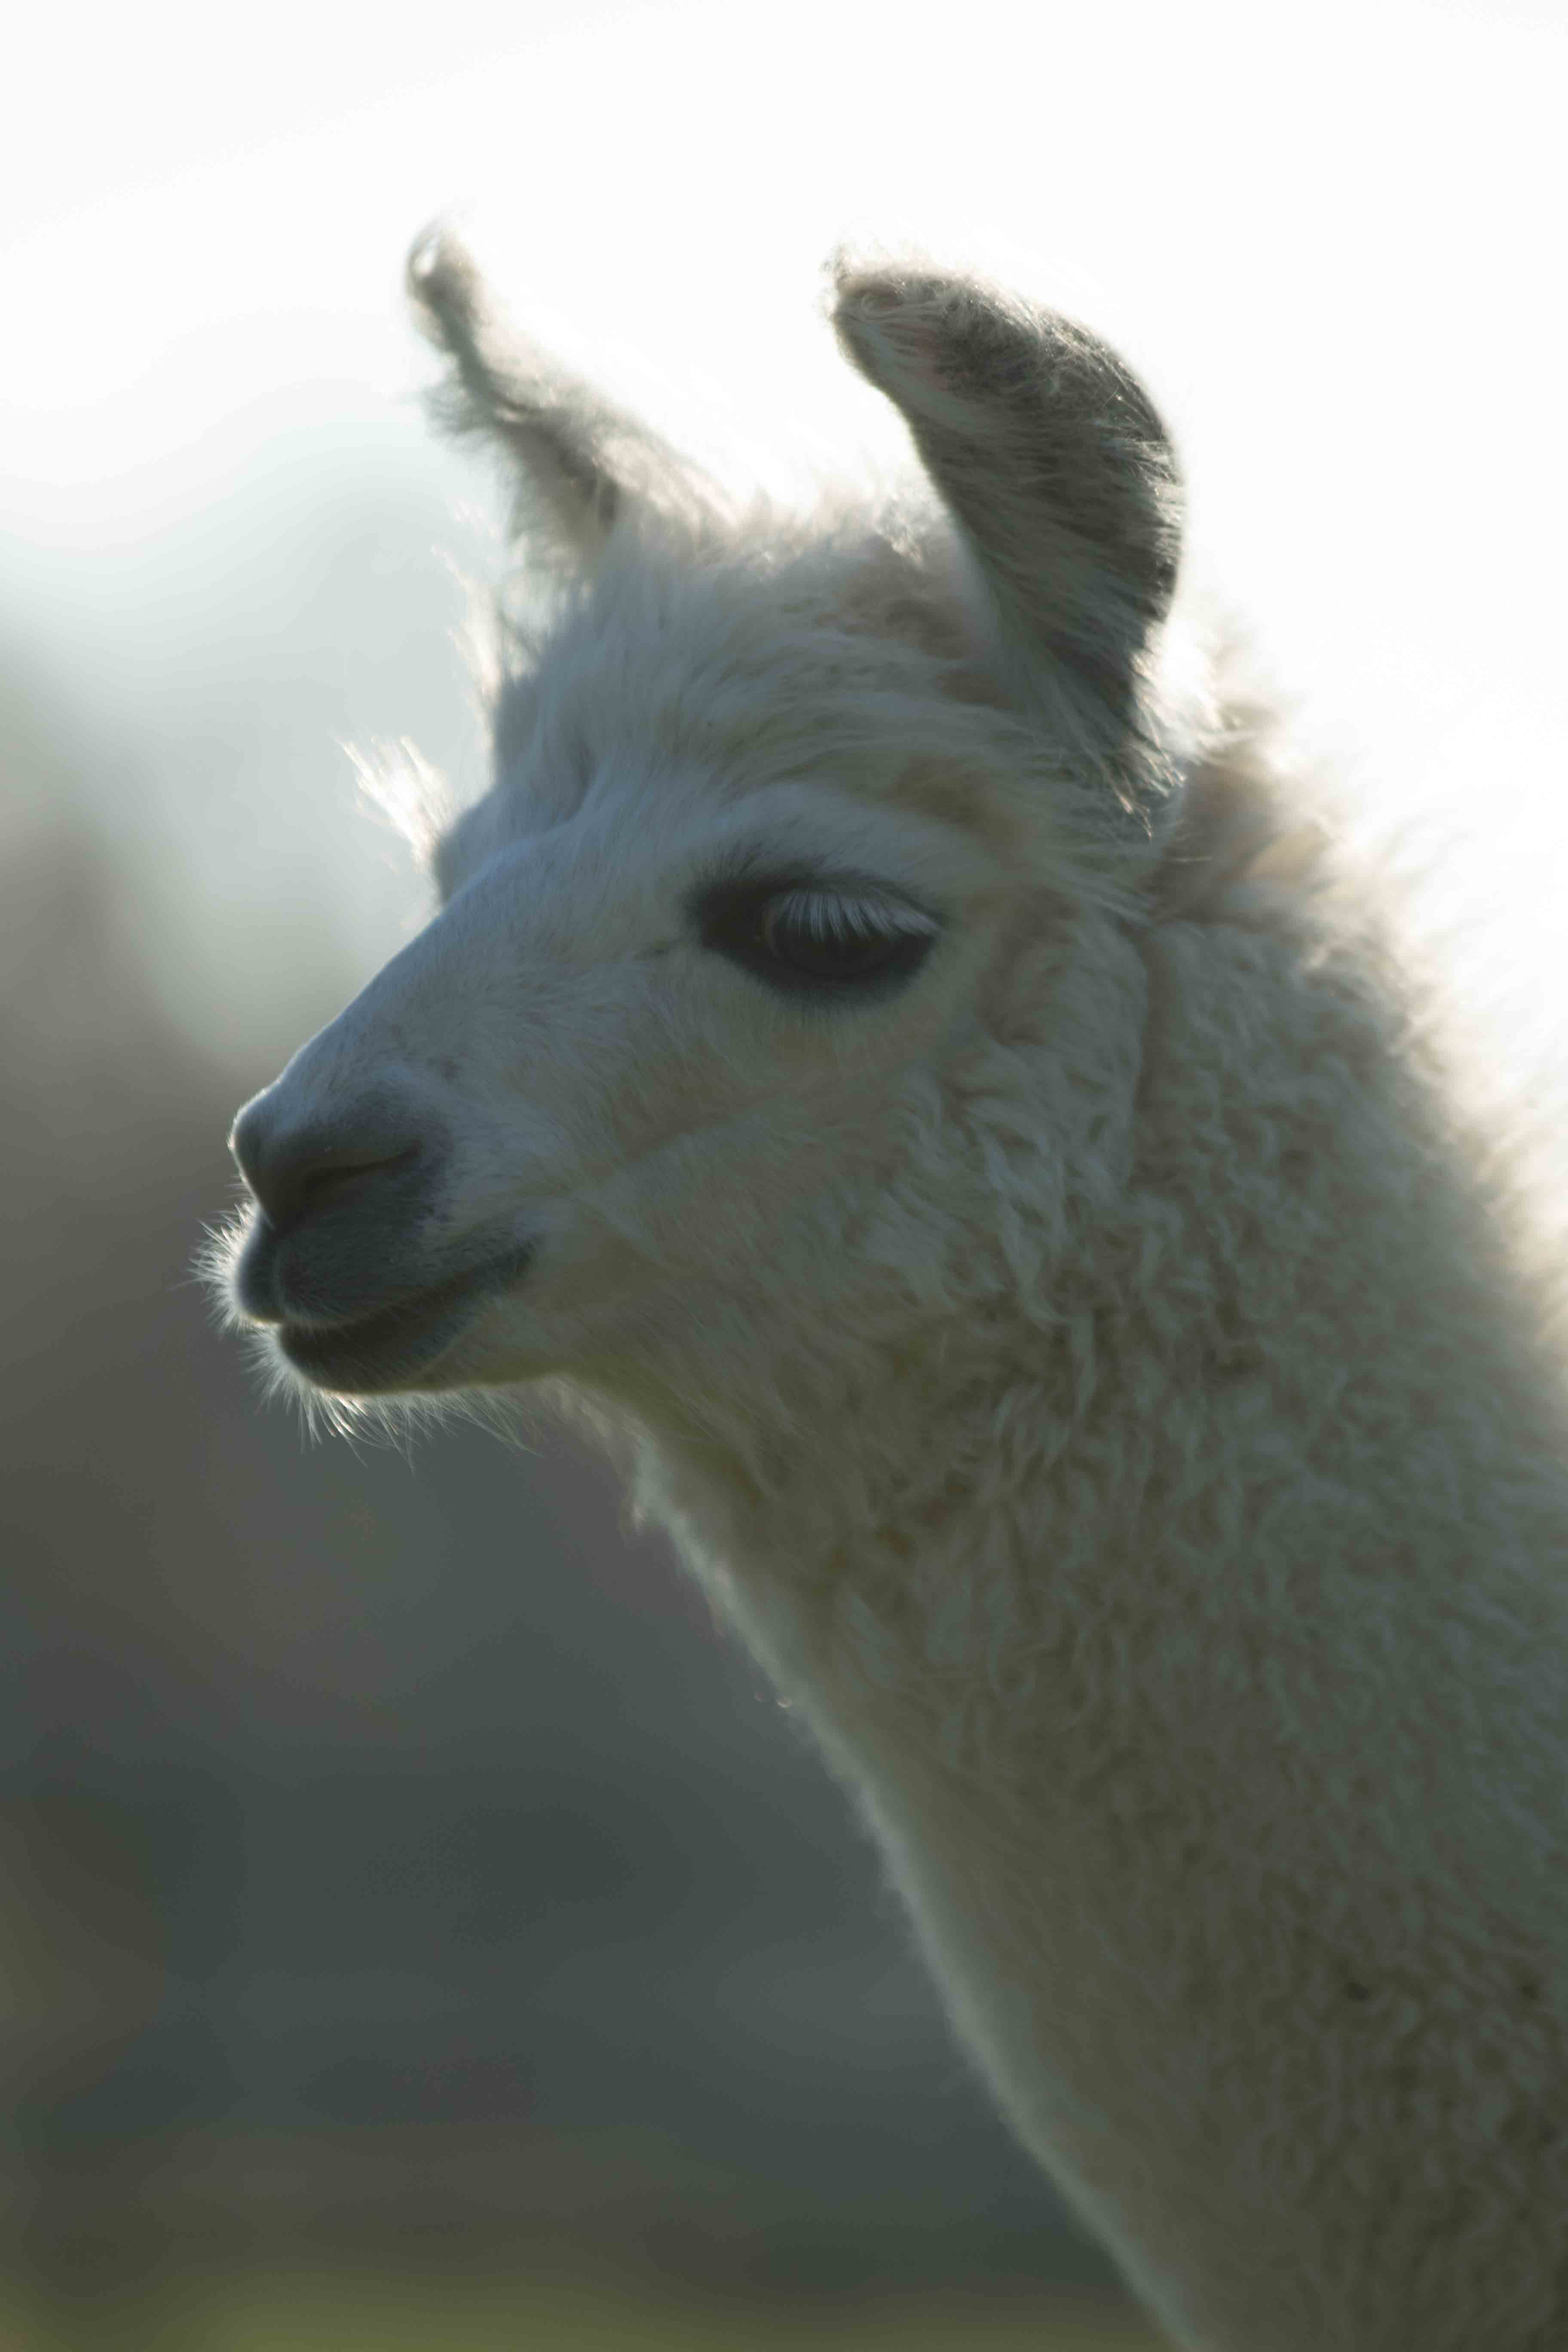 Merlin llama at spring farm alpacas